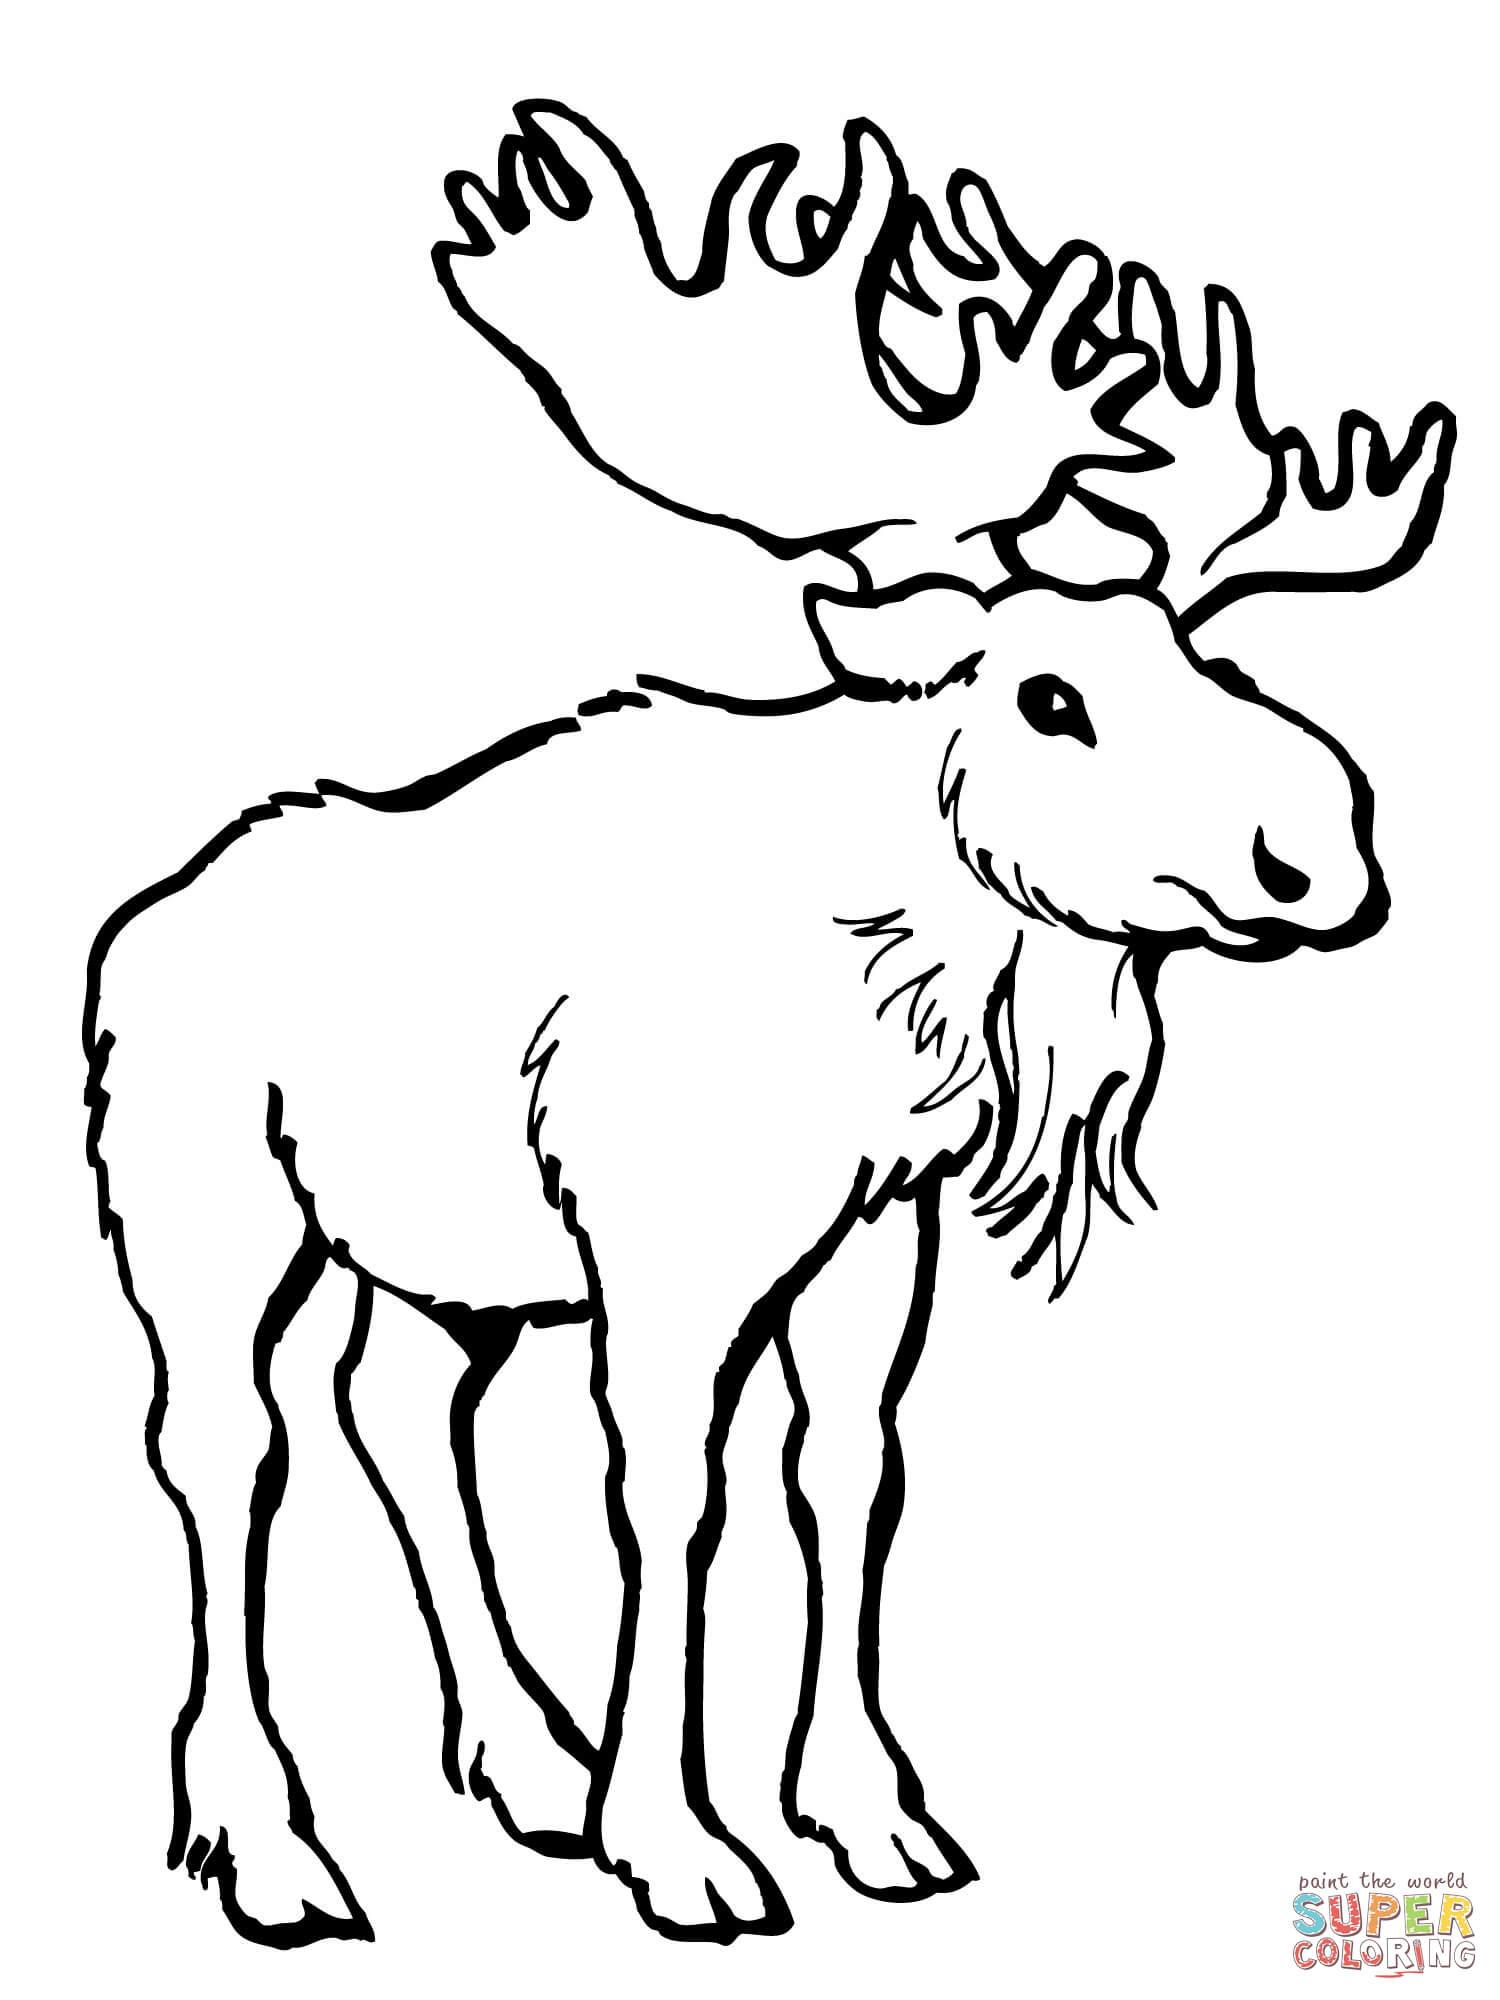 Alaska coloring page | Flag coloring pages, Alaska themed ... | 2000x1500